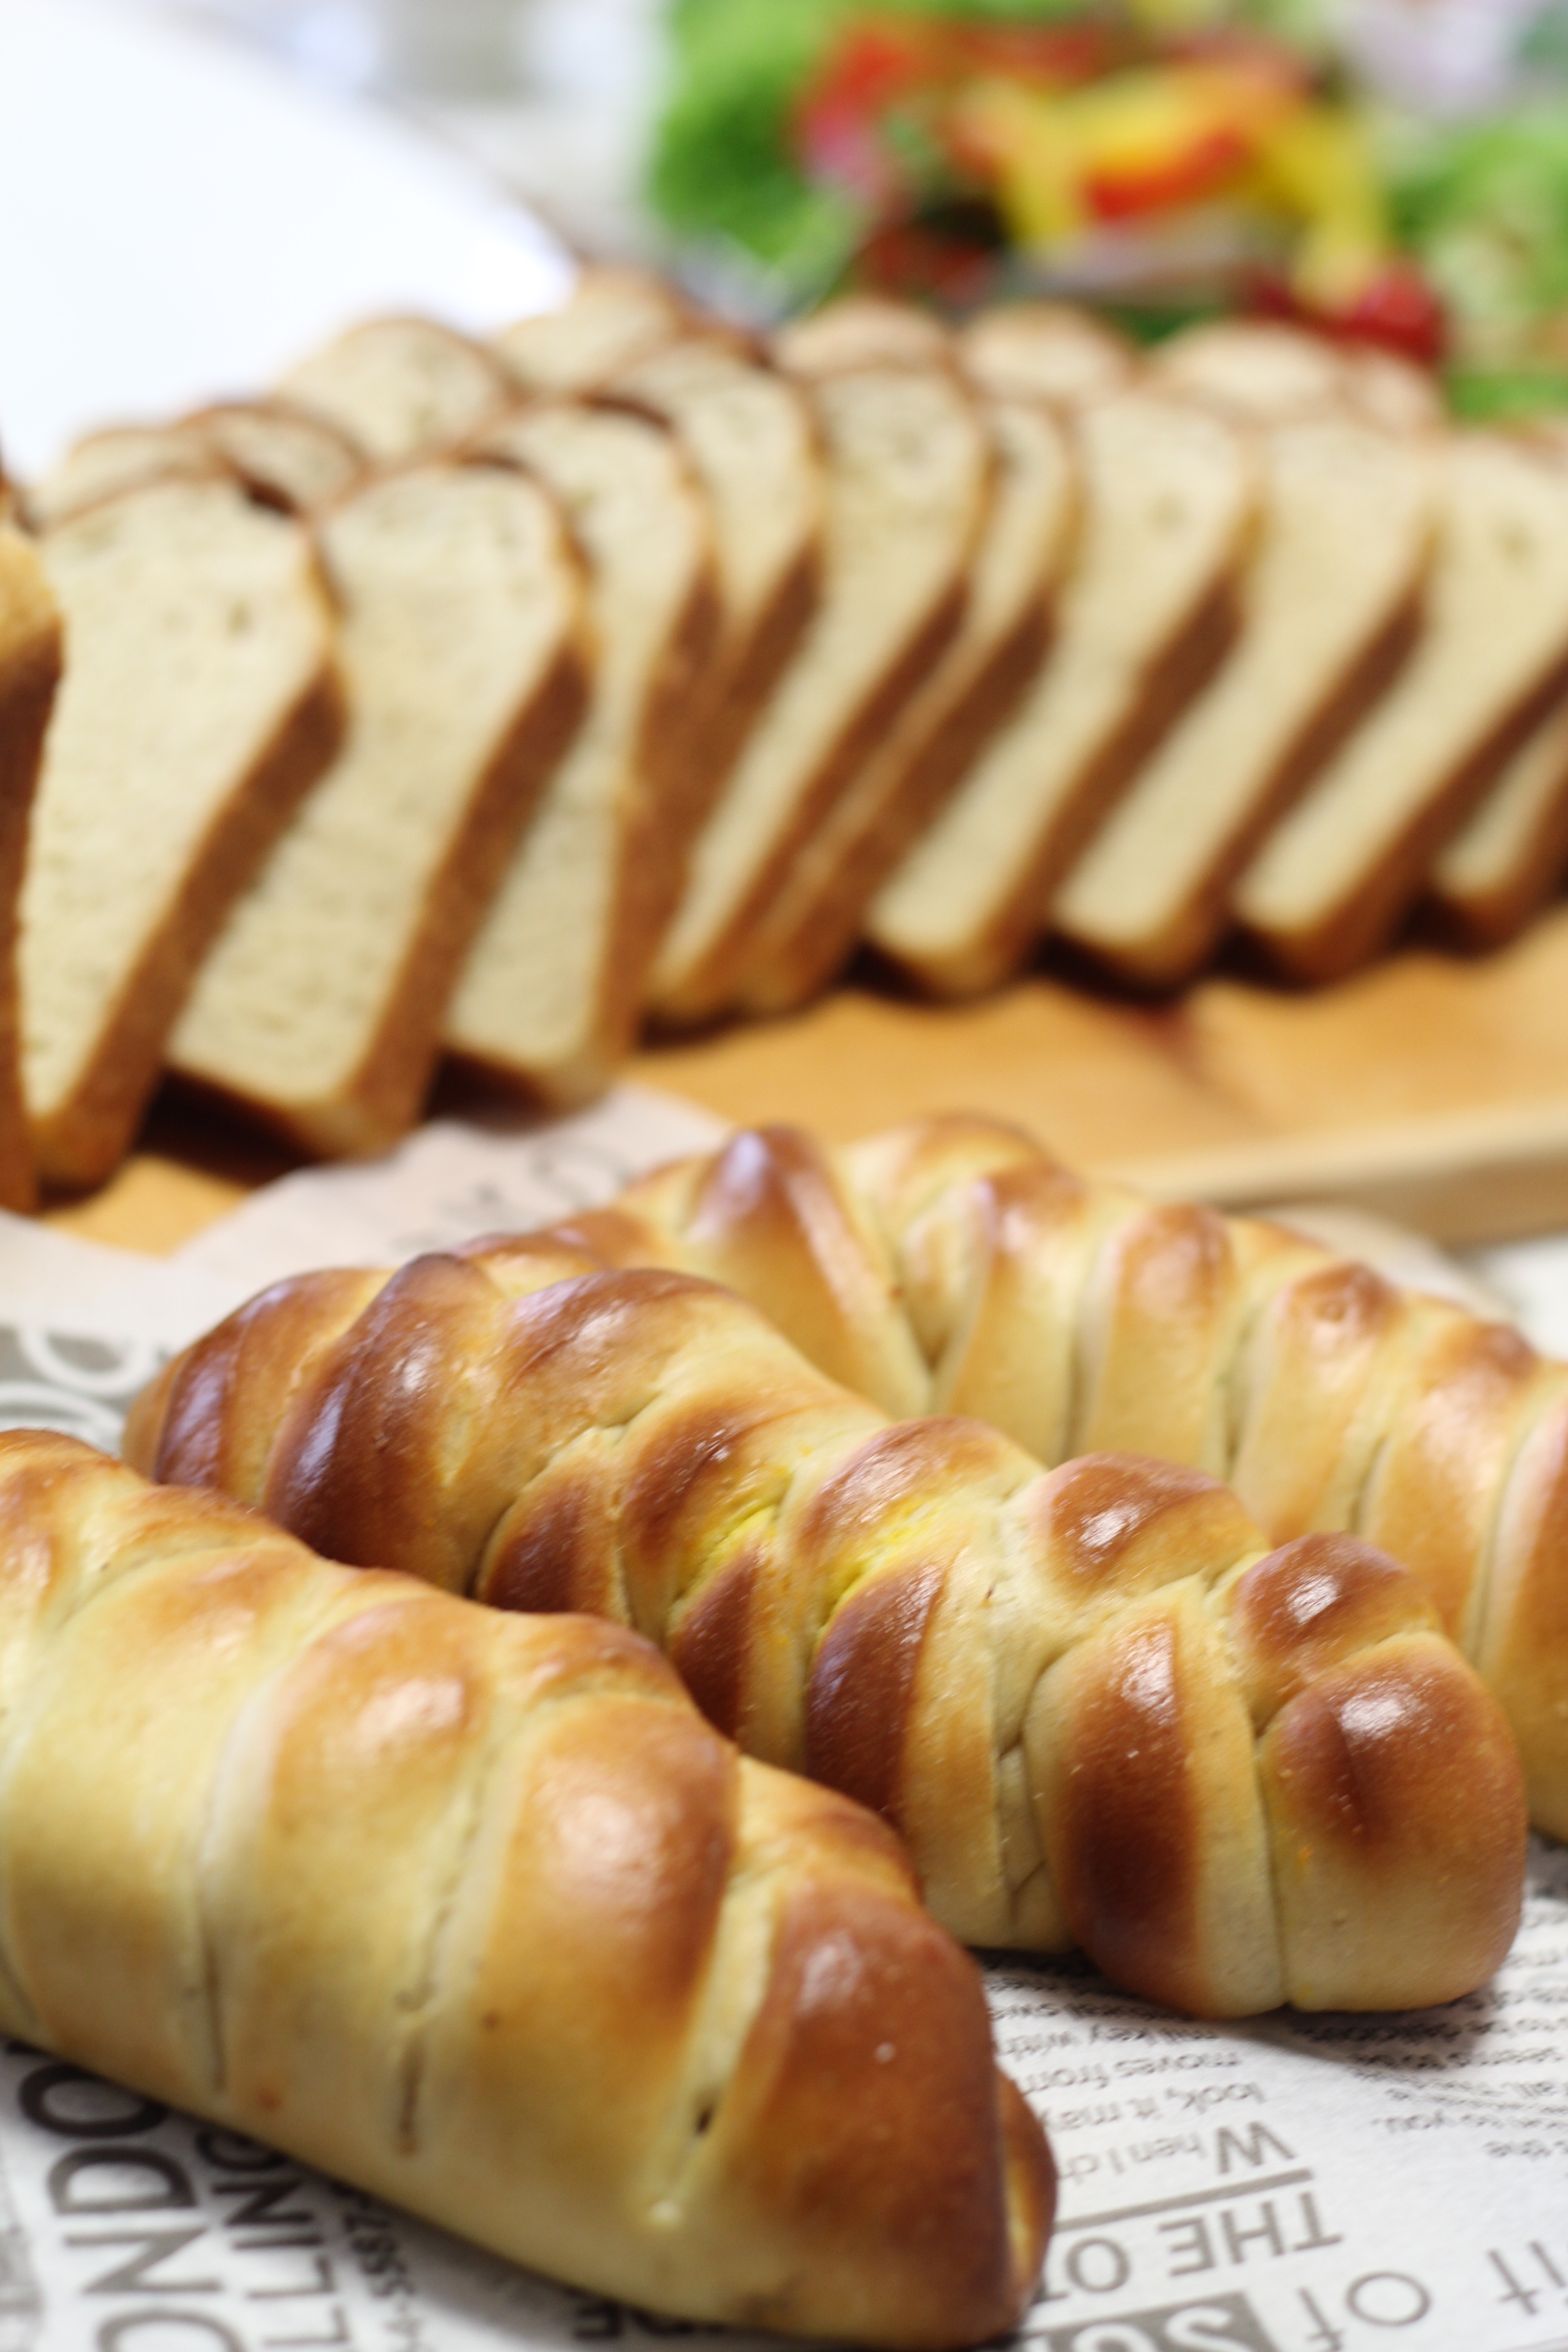 a-ta-sante糖質制限パン料理教室、京都江部粉糖質制限パンアドバンスコース3回目『変わり山食&レンチパン』